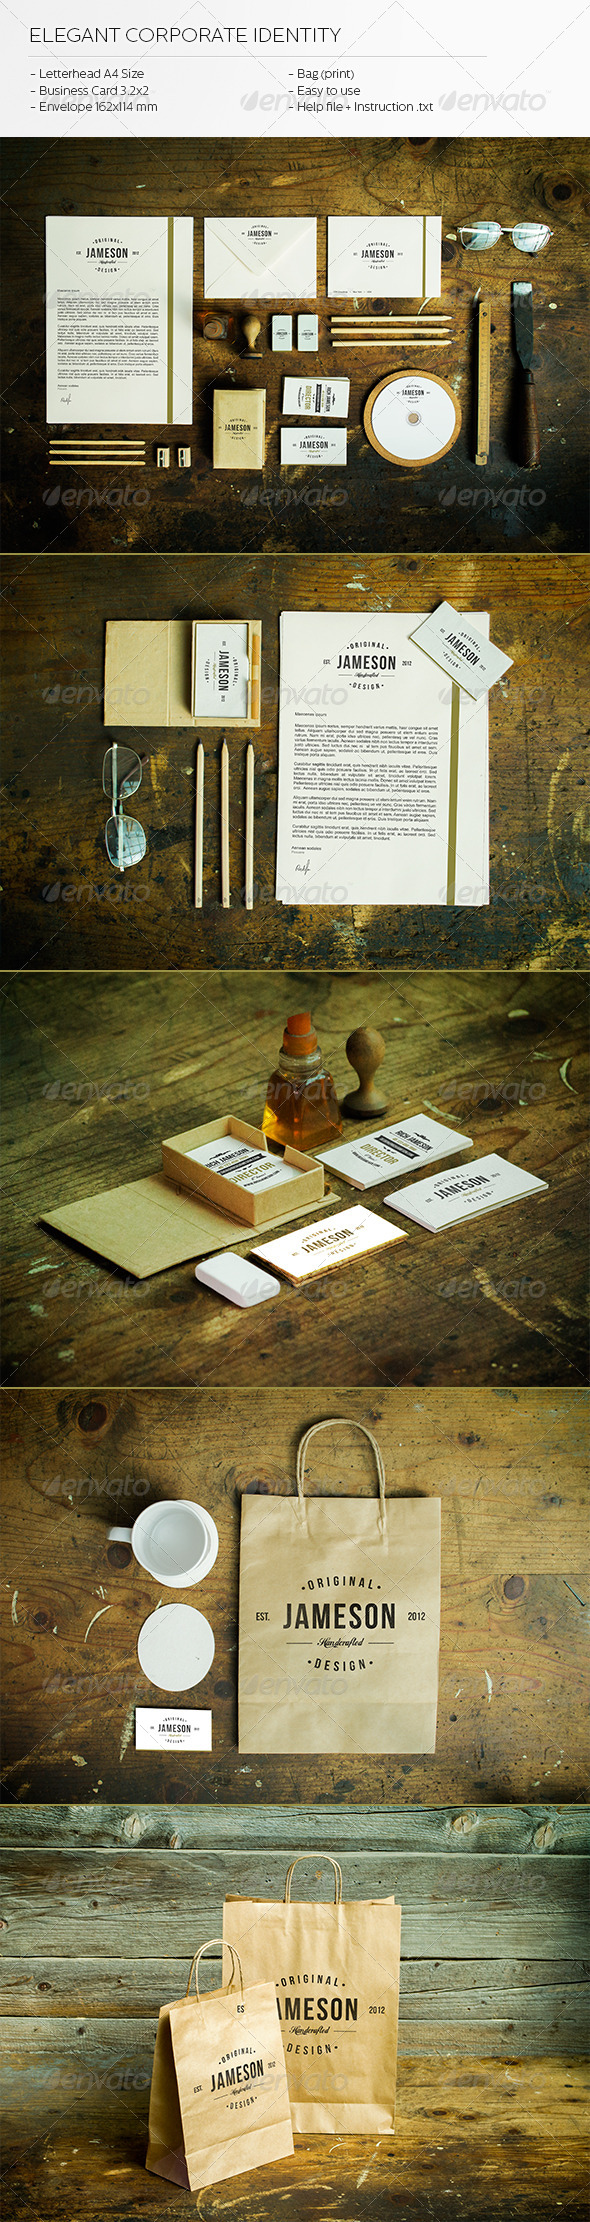 Elegant Corporate Identity - Stationery Print Templates